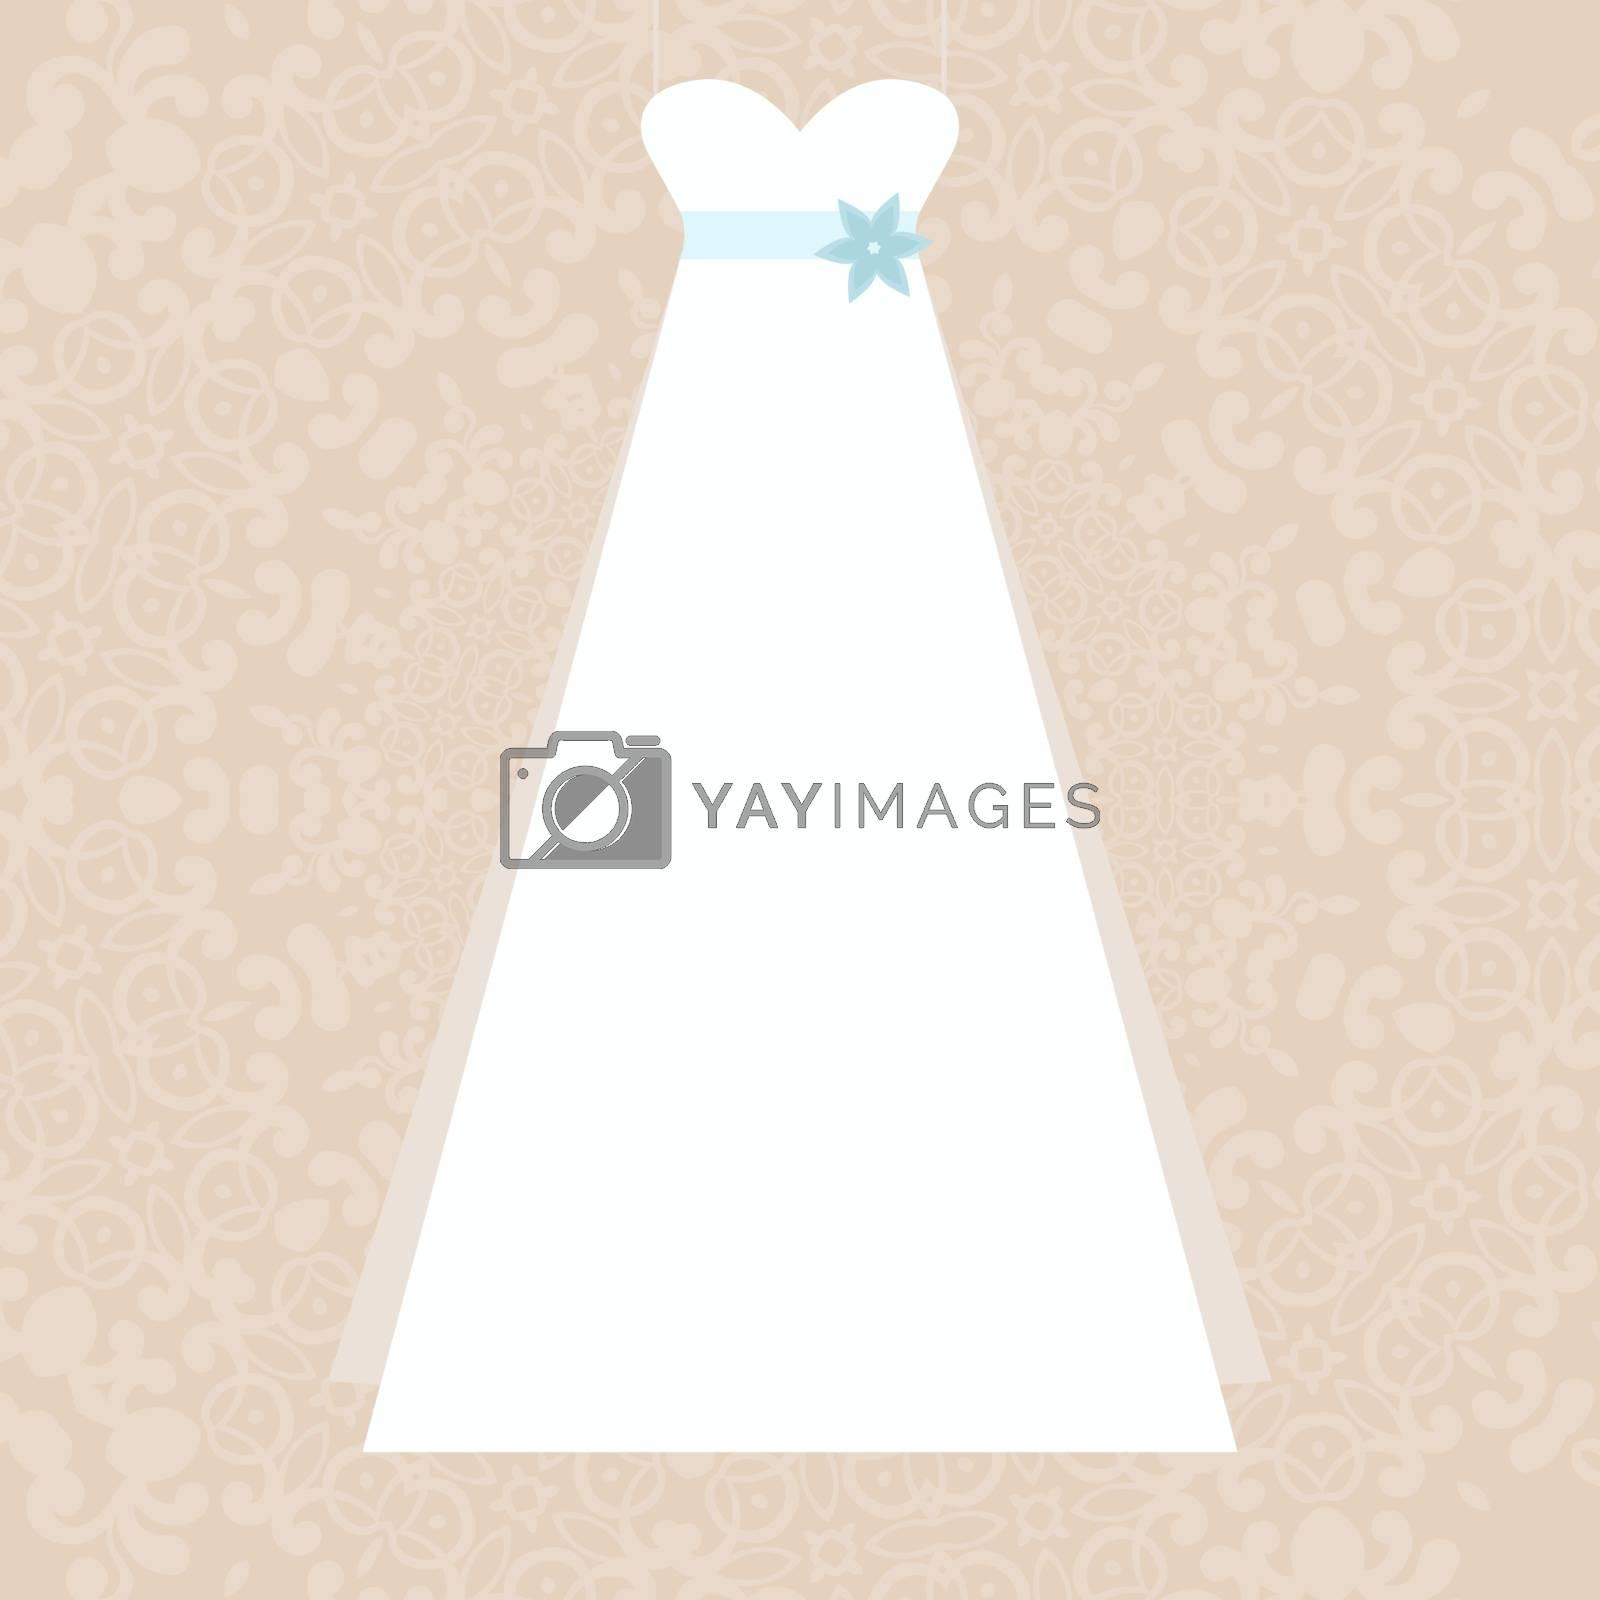 Elegant white dress illustration - symbol of a wedding on elegant lace background made in vector. Bridal illustration, Invitation template.